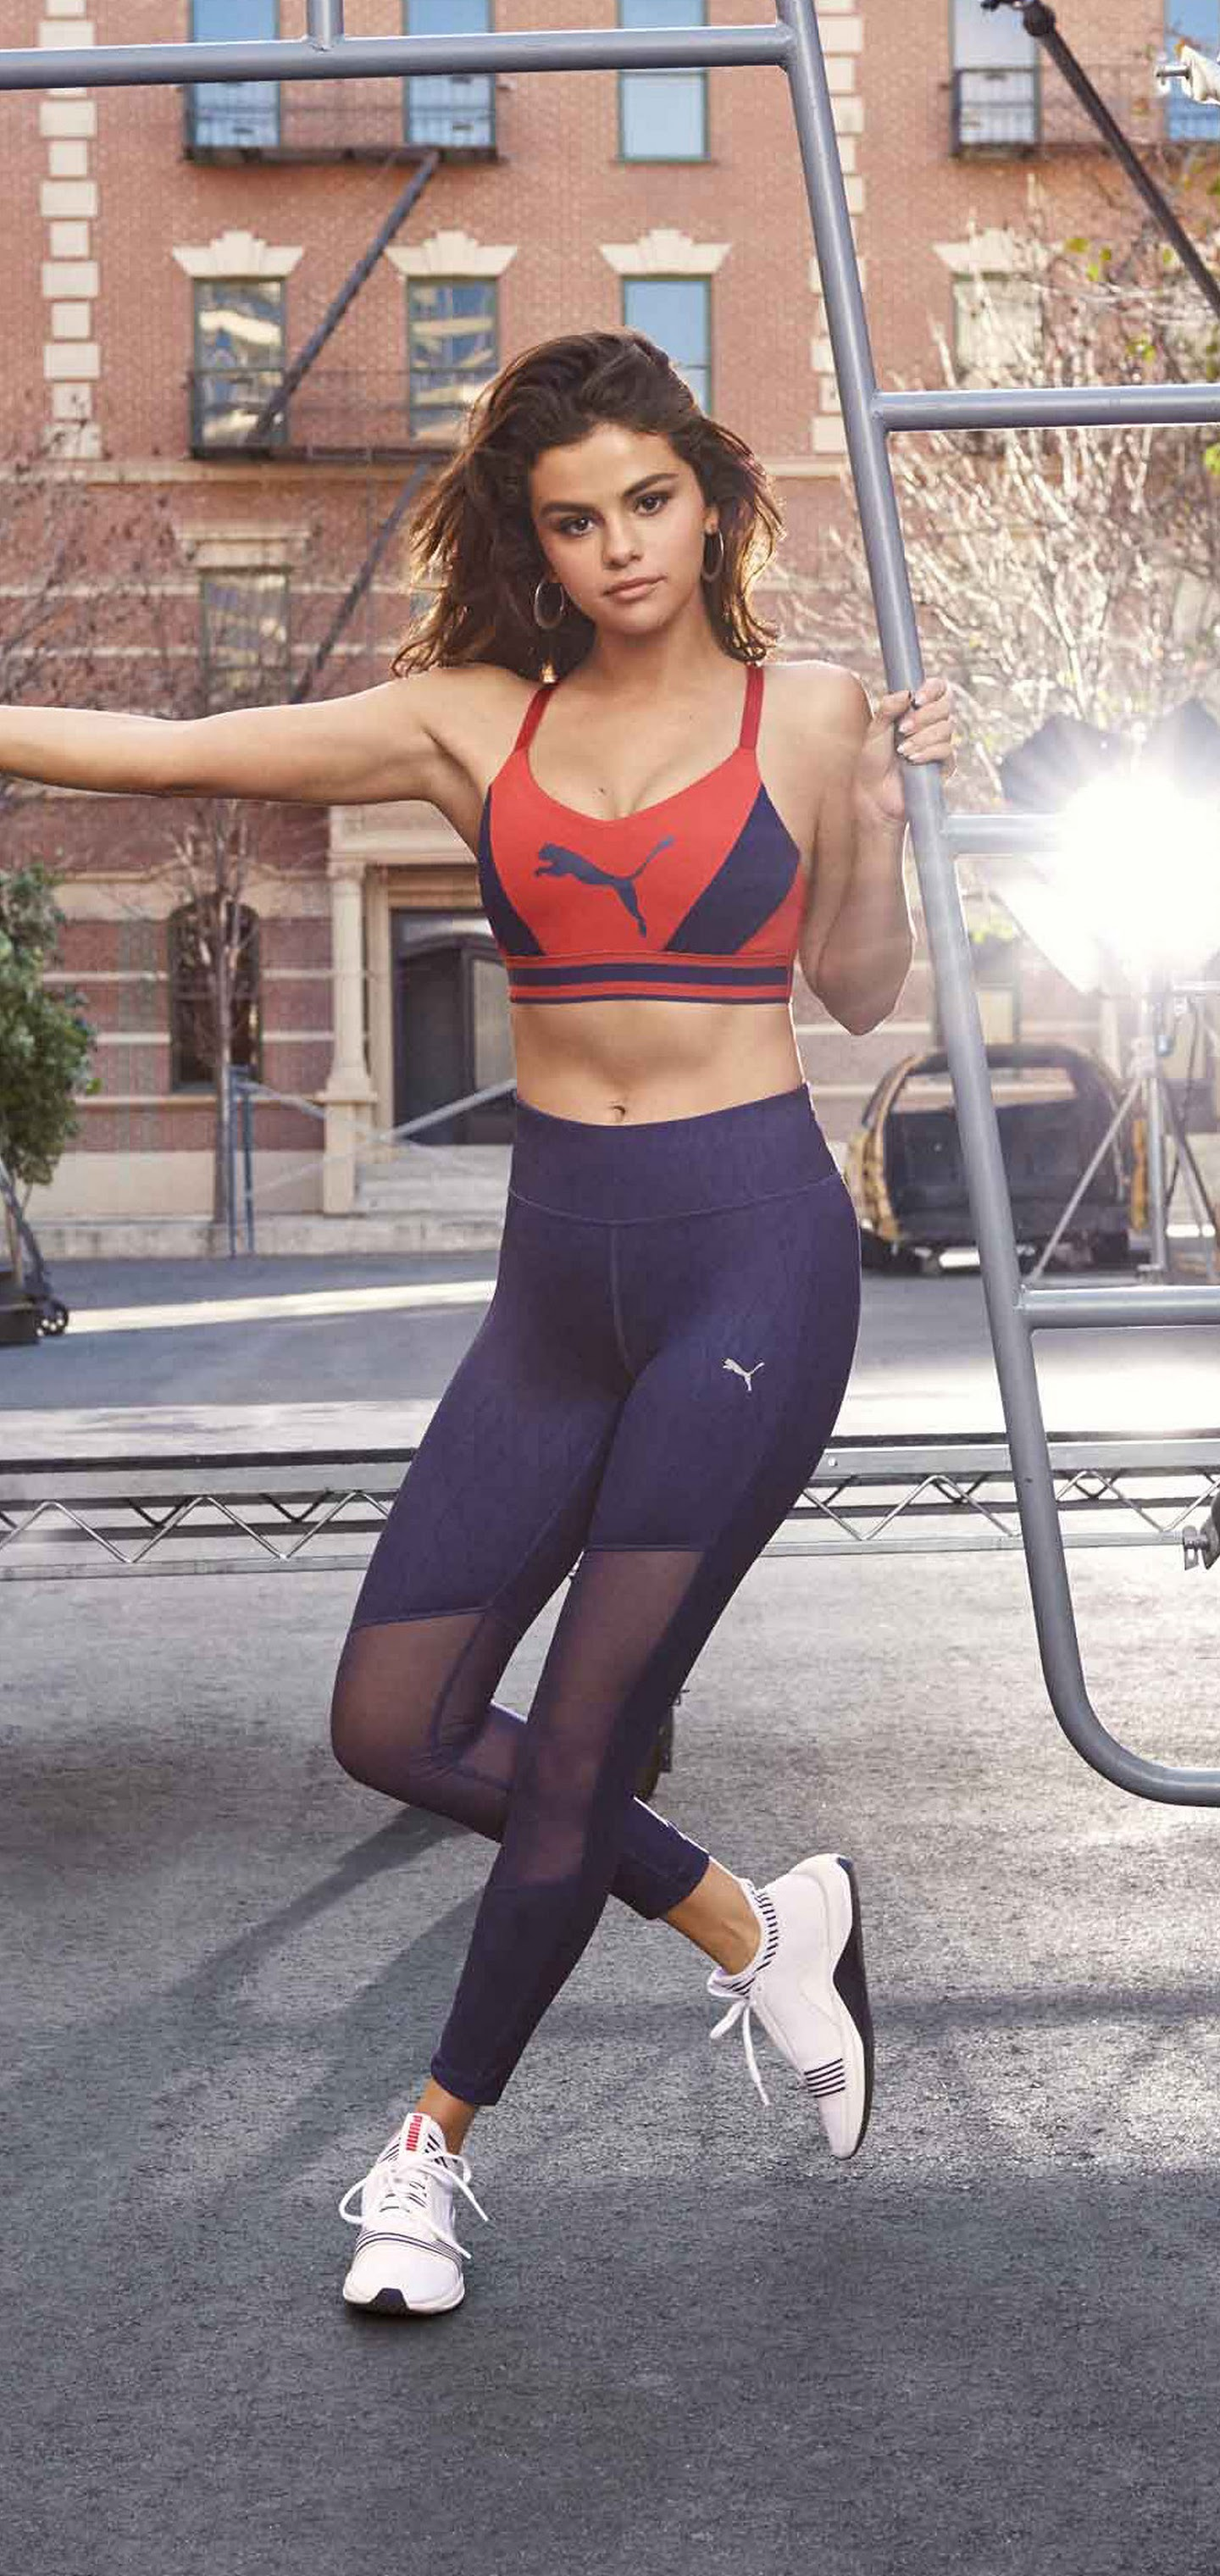 Selena Gomez Puma Model Brunette Women 4k Wallpaper 320